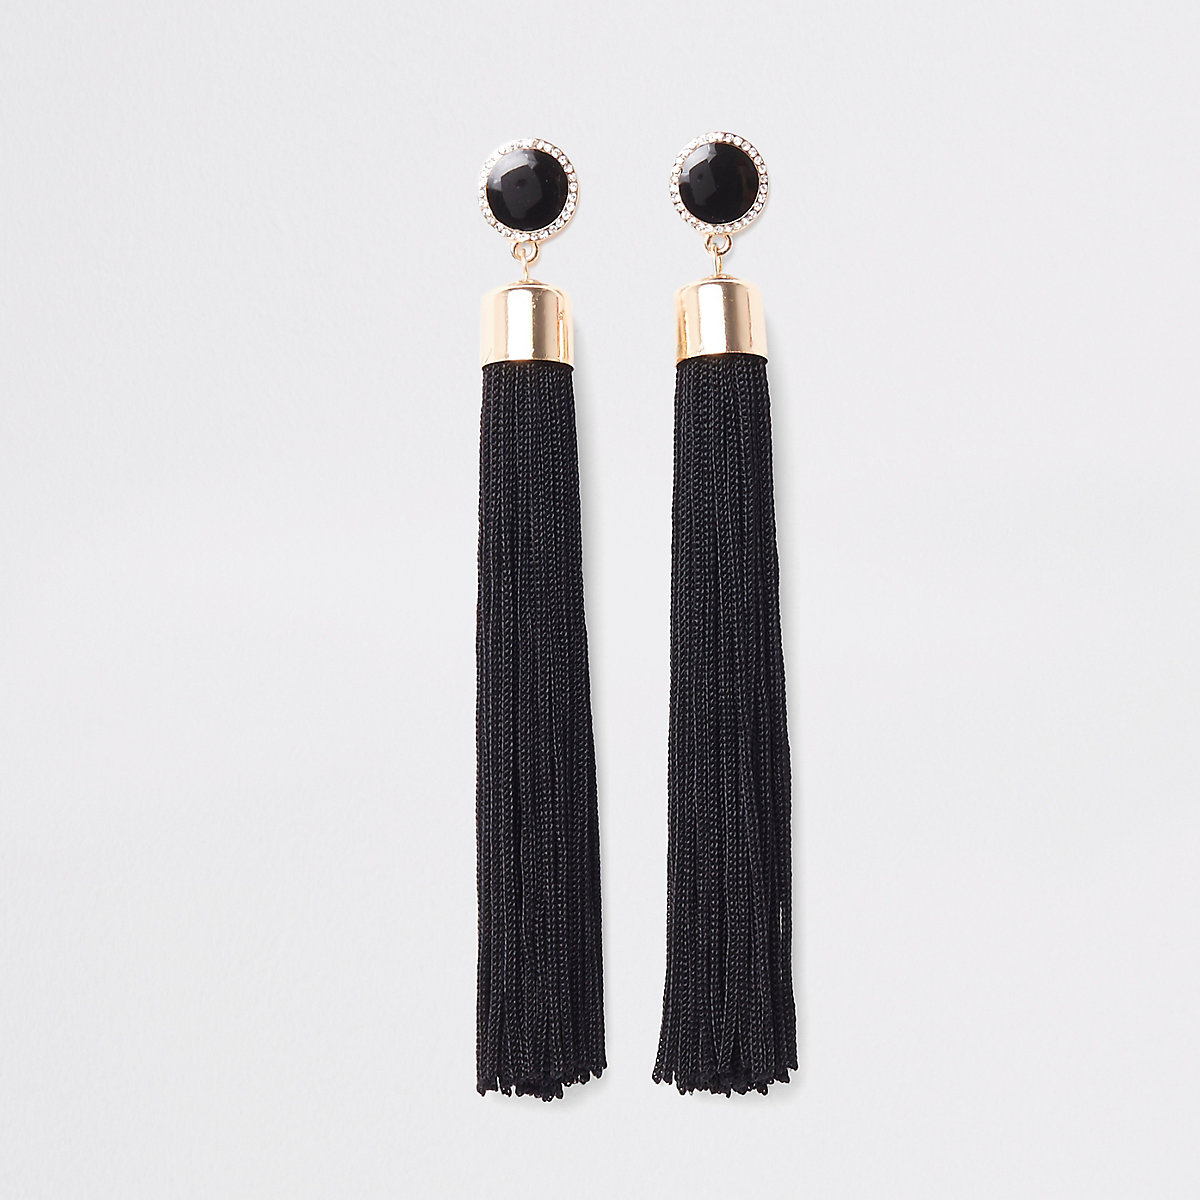 Black tassel drop stud earrings